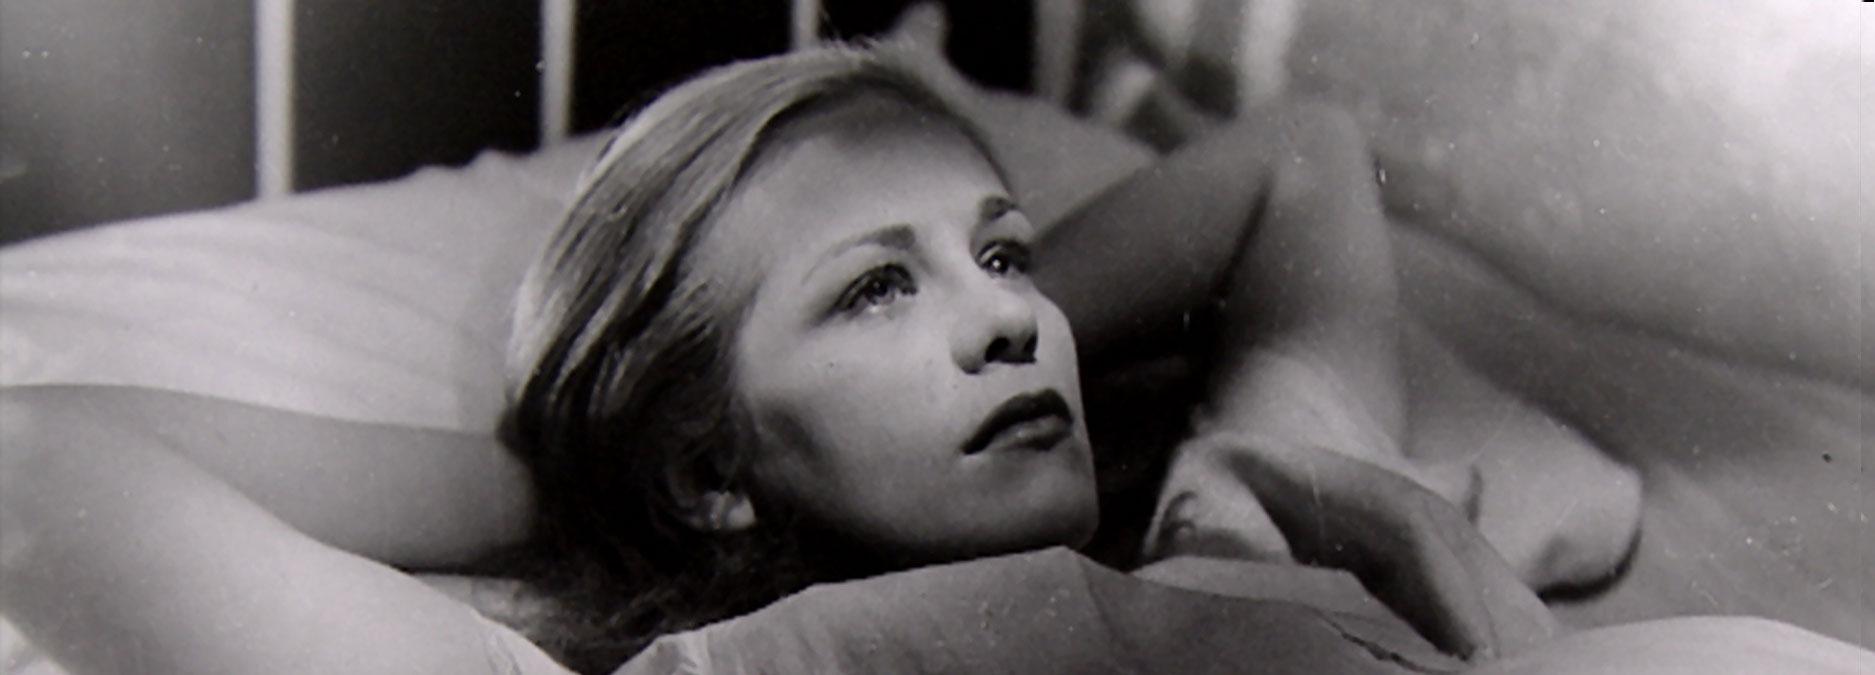 Blueprint film malvernweather Image collections